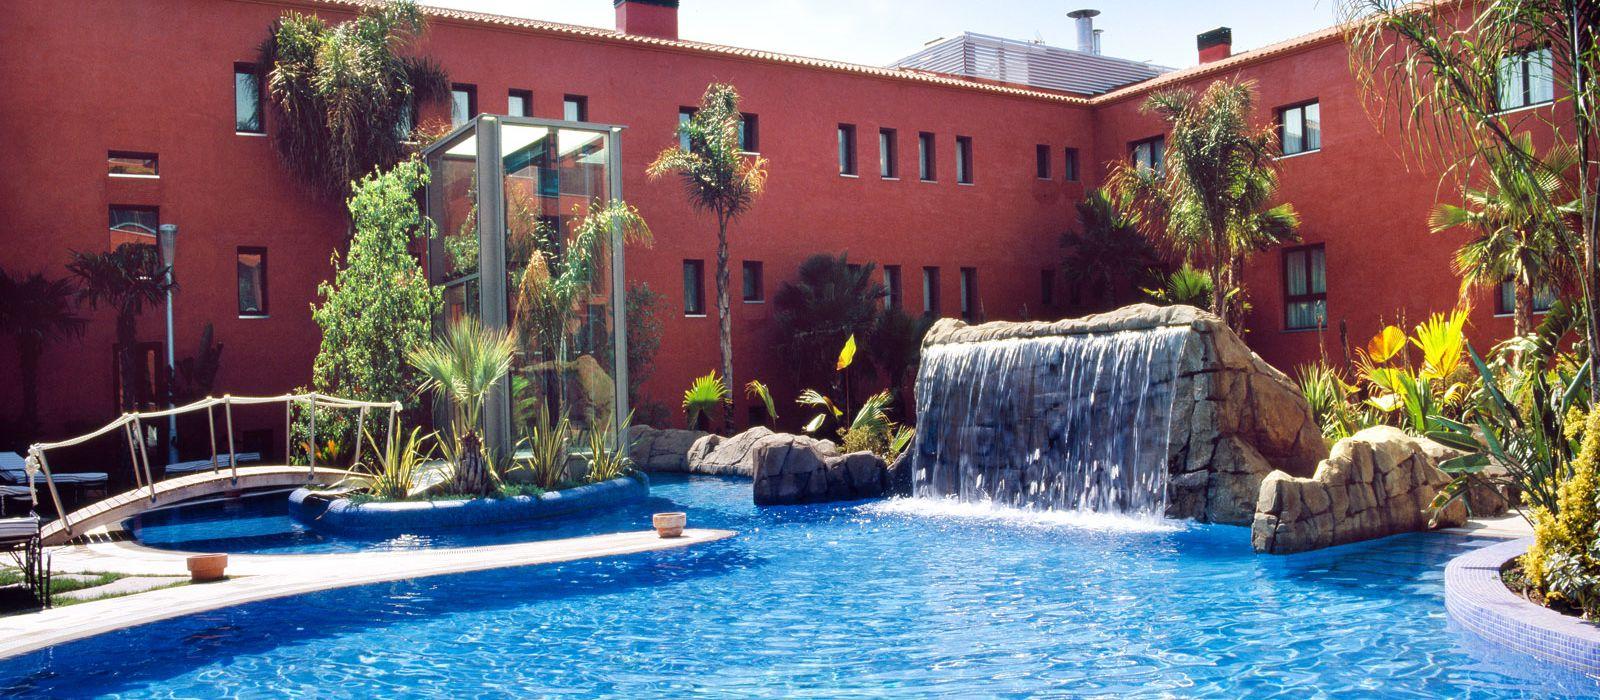 Histoire Hotel la Garriga | Hotel Blancafort